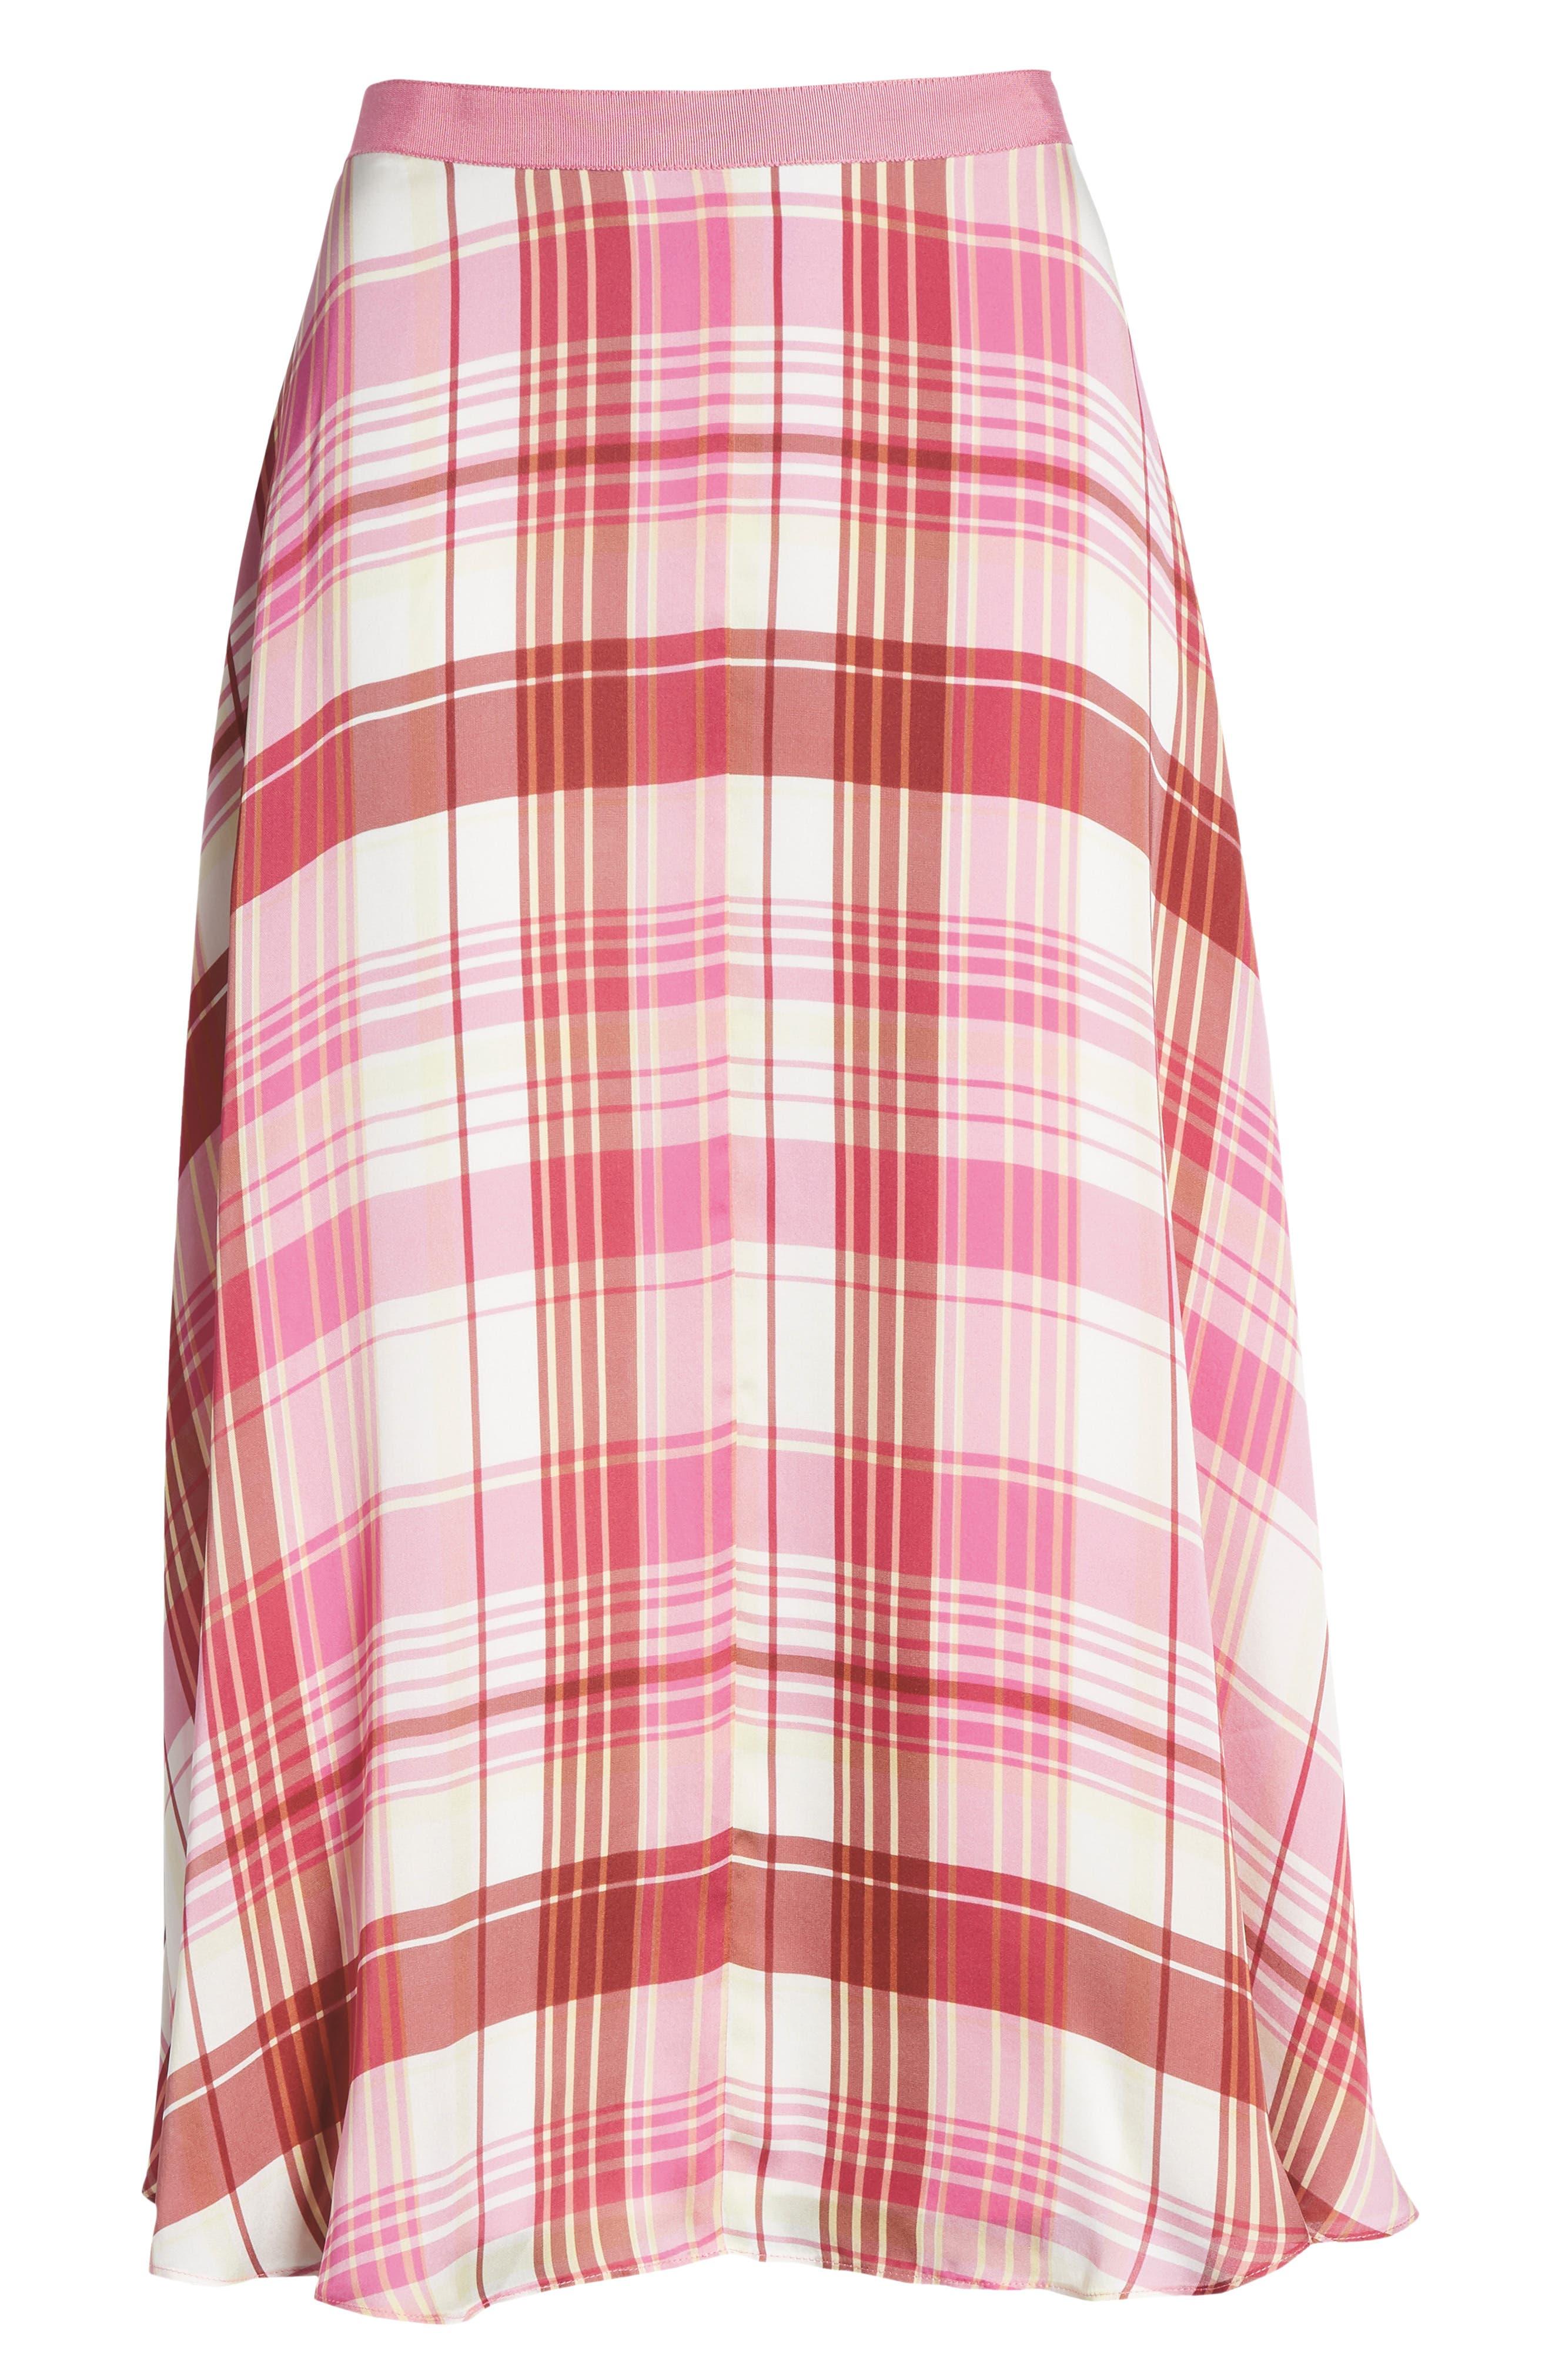 Plaid Silk Skirt,                             Alternate thumbnail 7, color,                             PINK PHLOX LARA PLAID